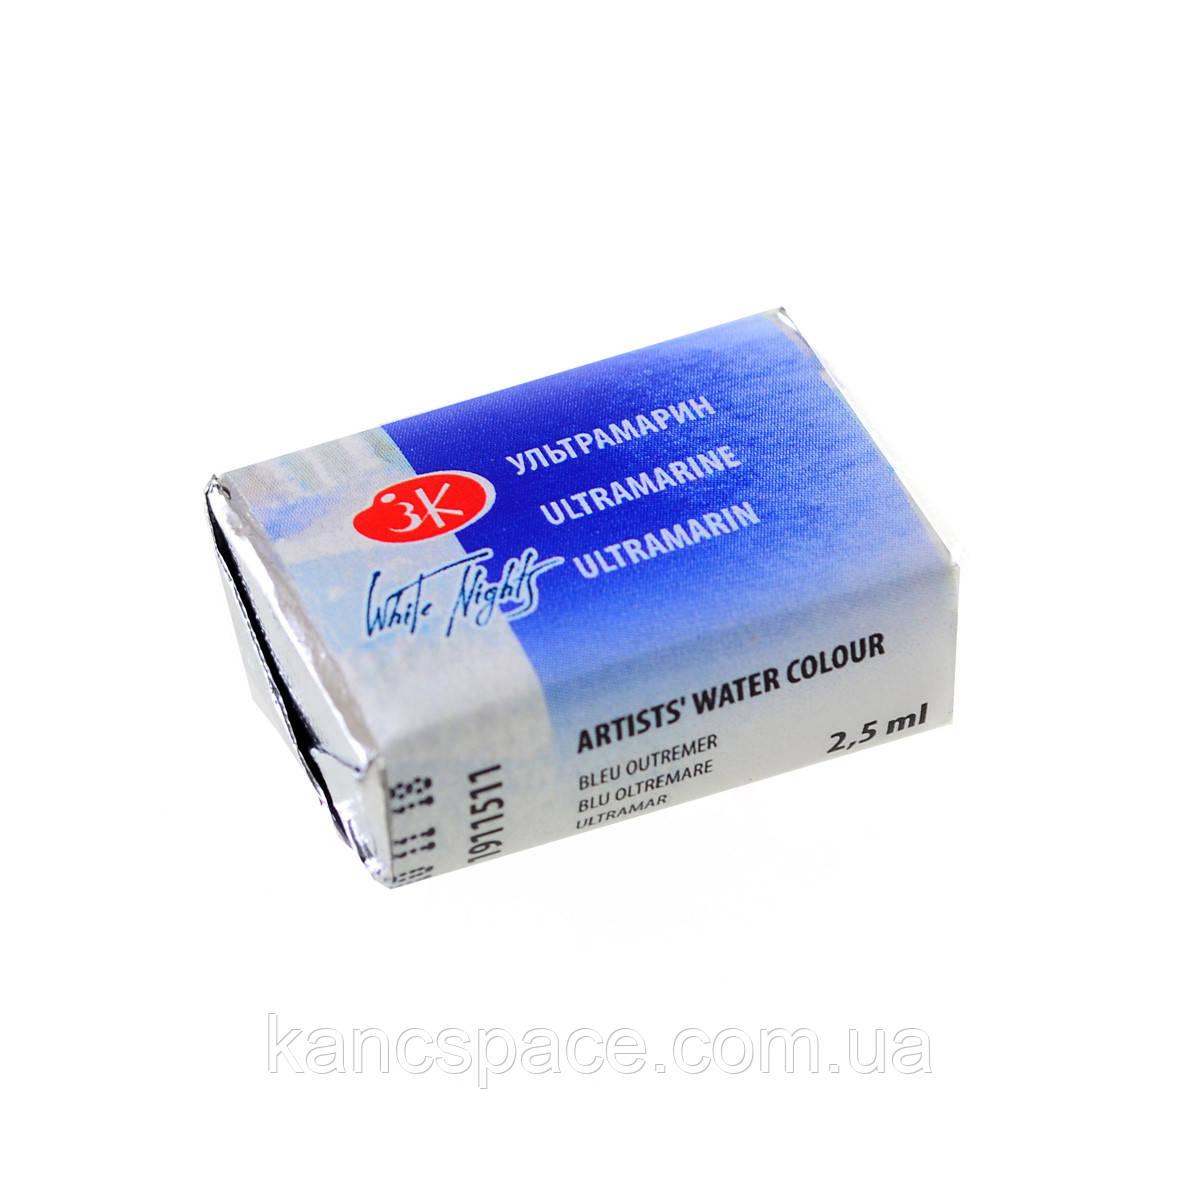 Фарба акварельна КЮВЕТА, ультрамарин, 2.5мл ЗХК